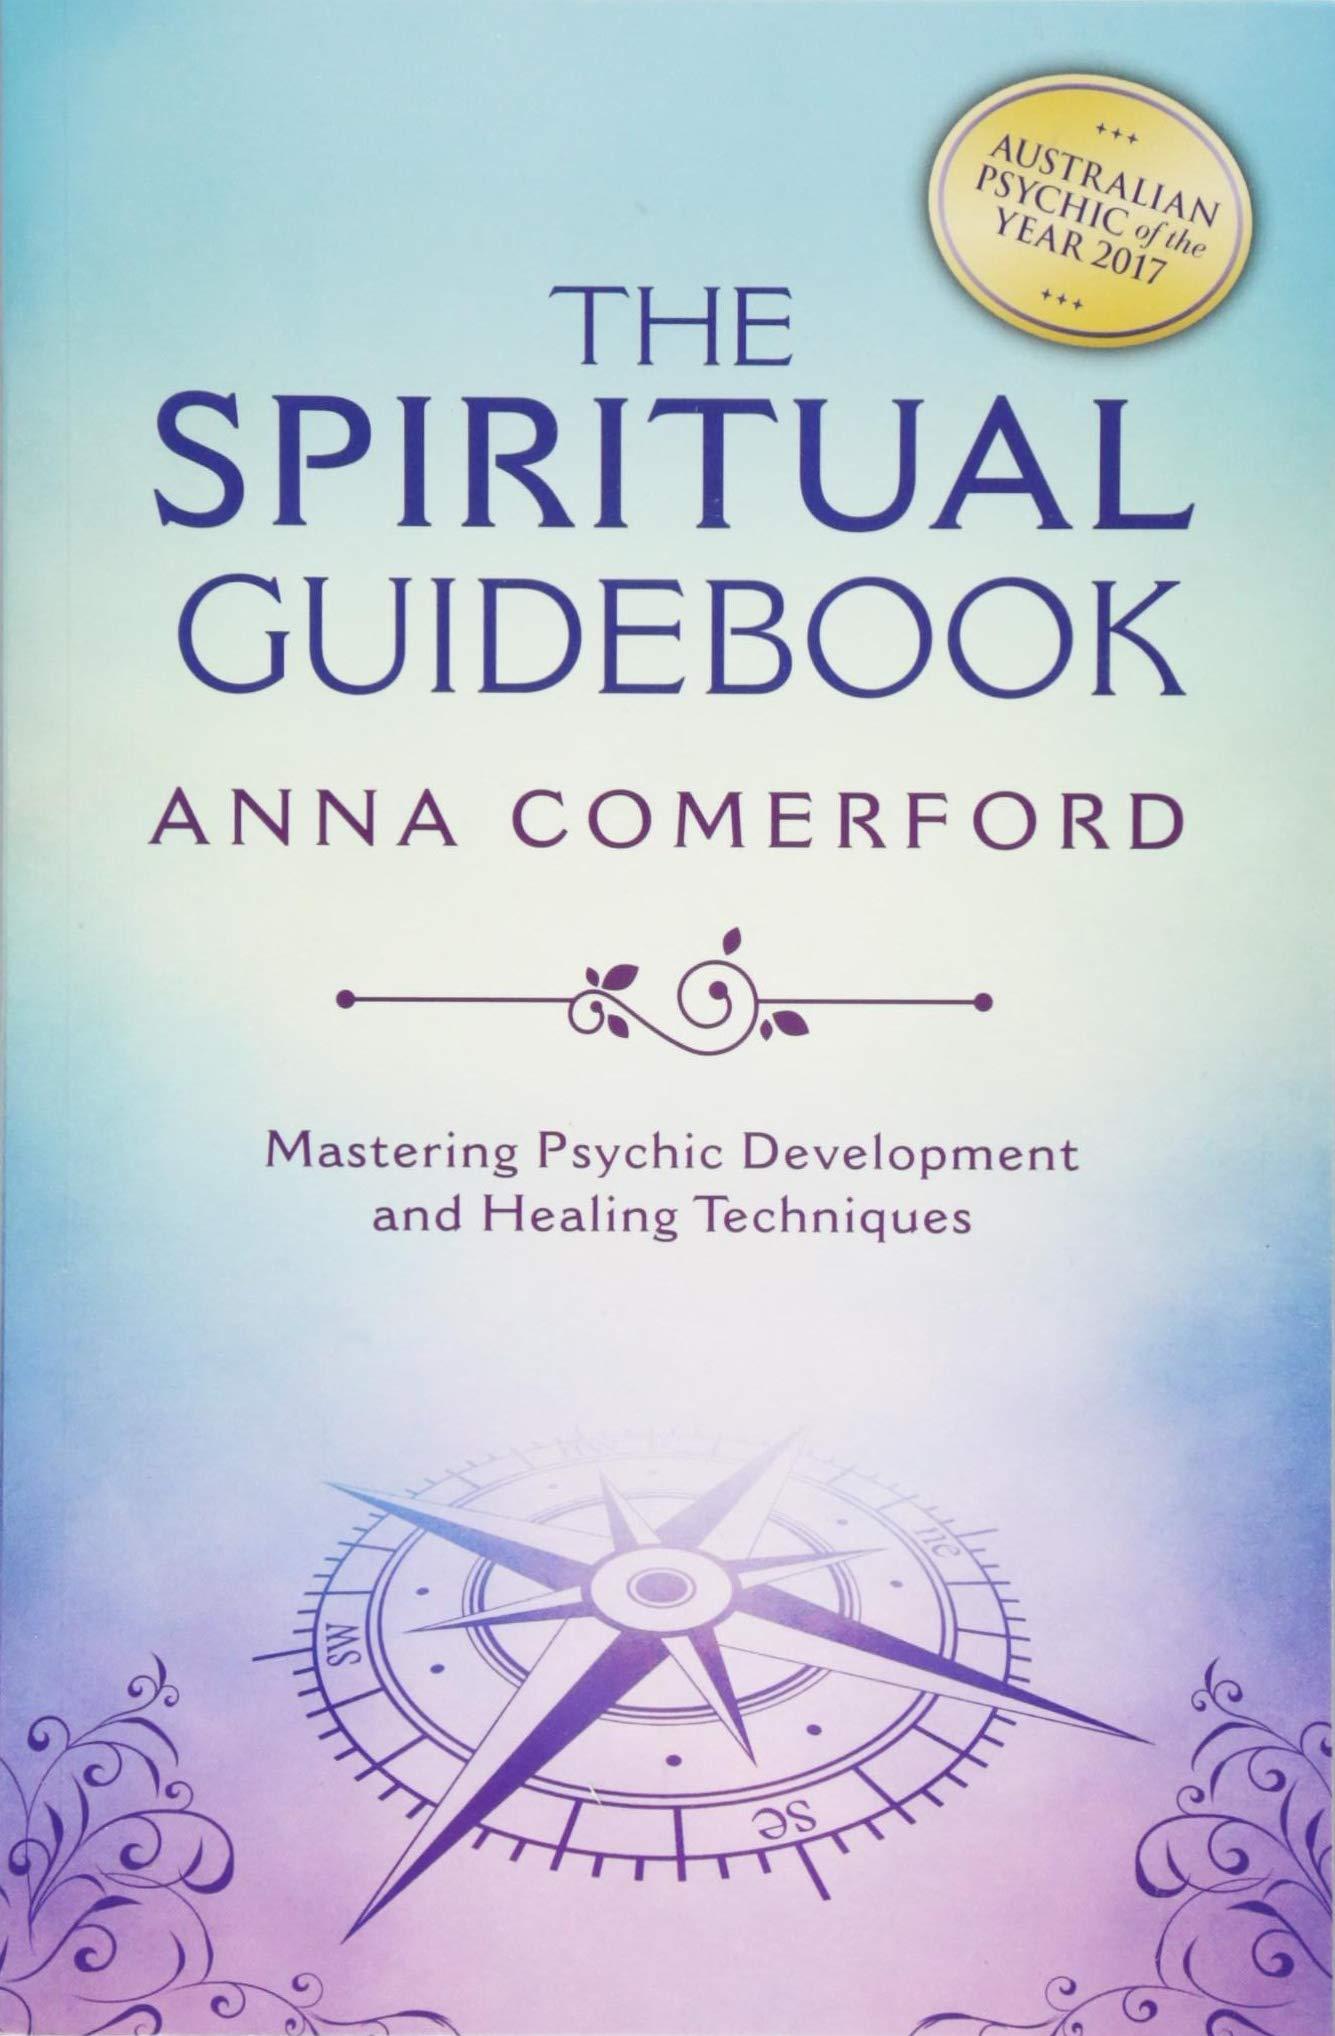 The Spiritual Guidebook: Mastering Psychic